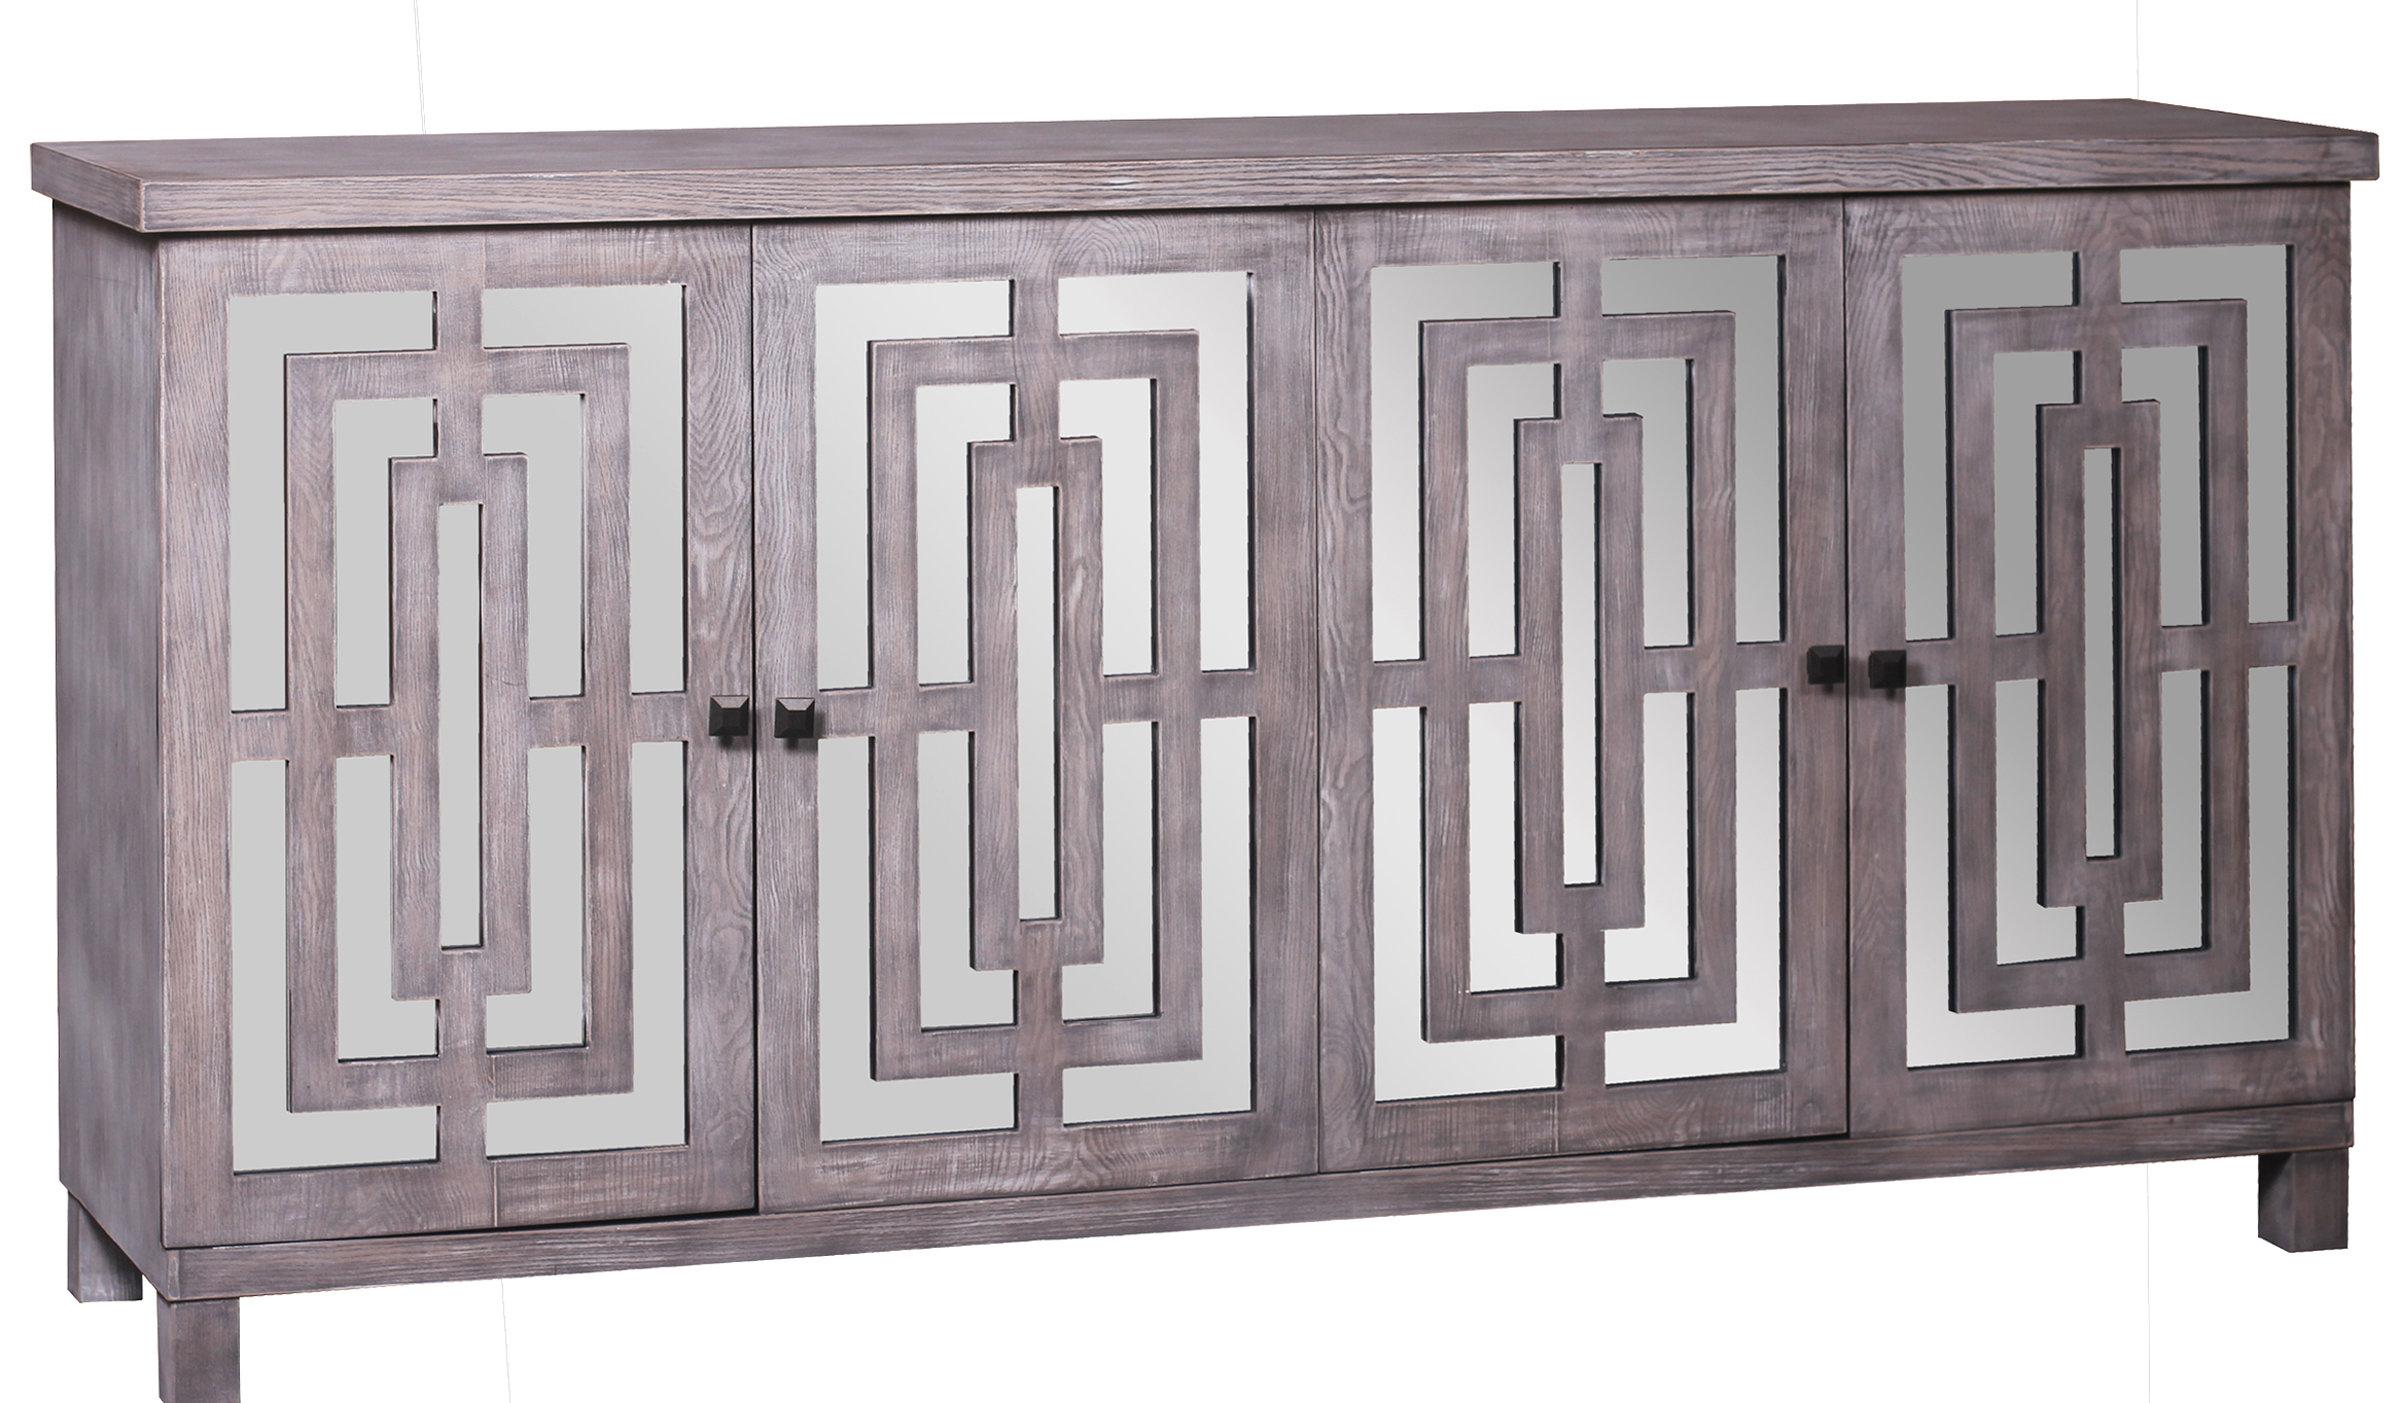 Modern & Contemporary Kieth 4 Door Credenza | Allmodern For Kattie 4 Door Cabinets (View 16 of 20)